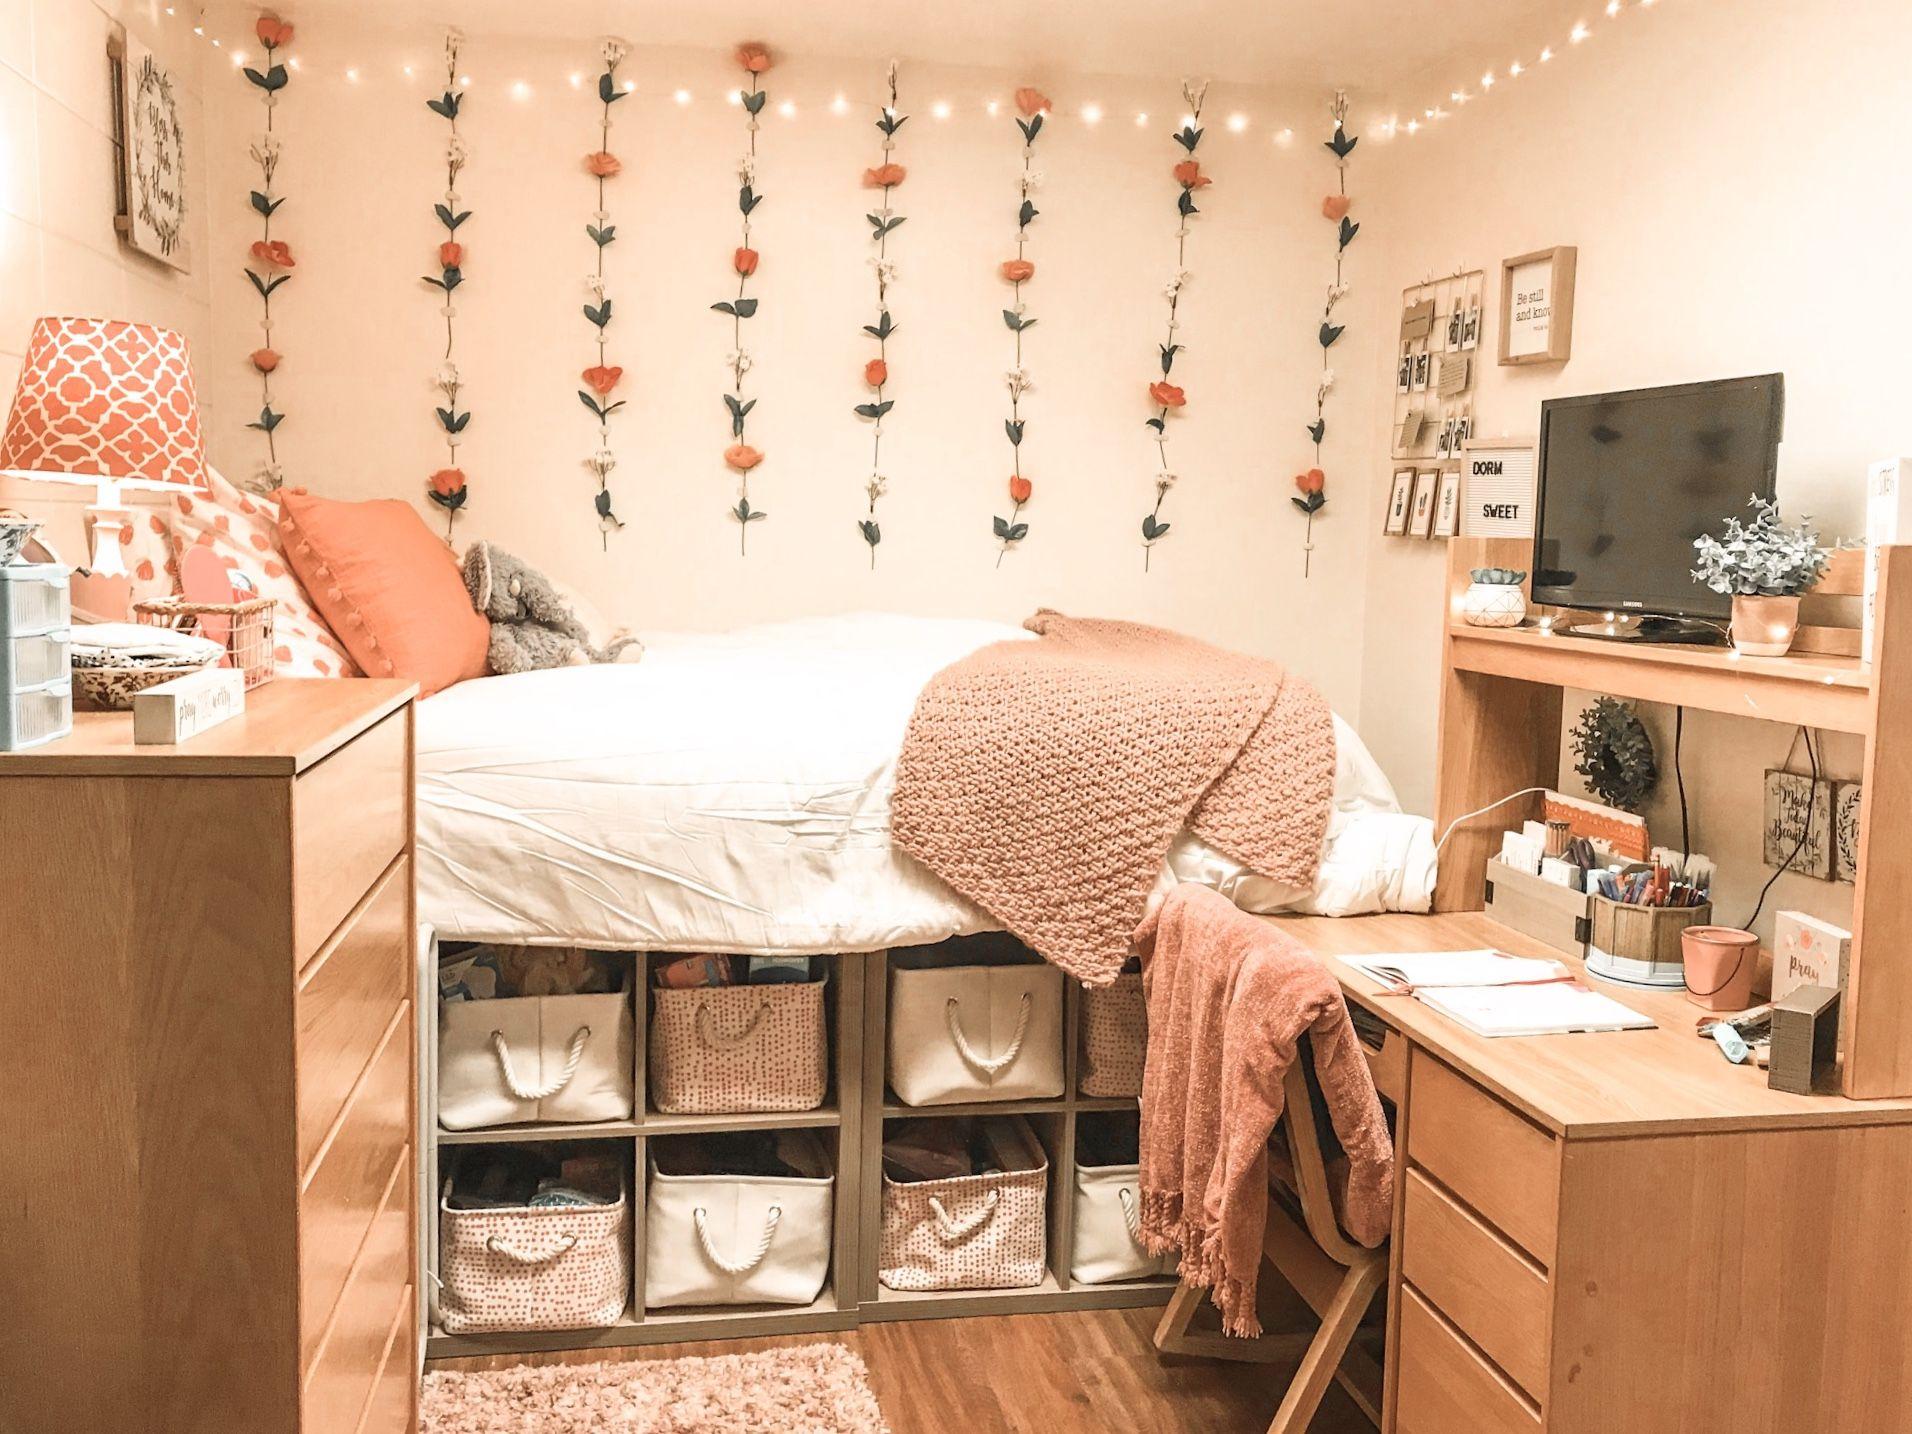 Peach Dorm Room College Bedroom Decor Classy Dorm Room College Dorm Room Decor